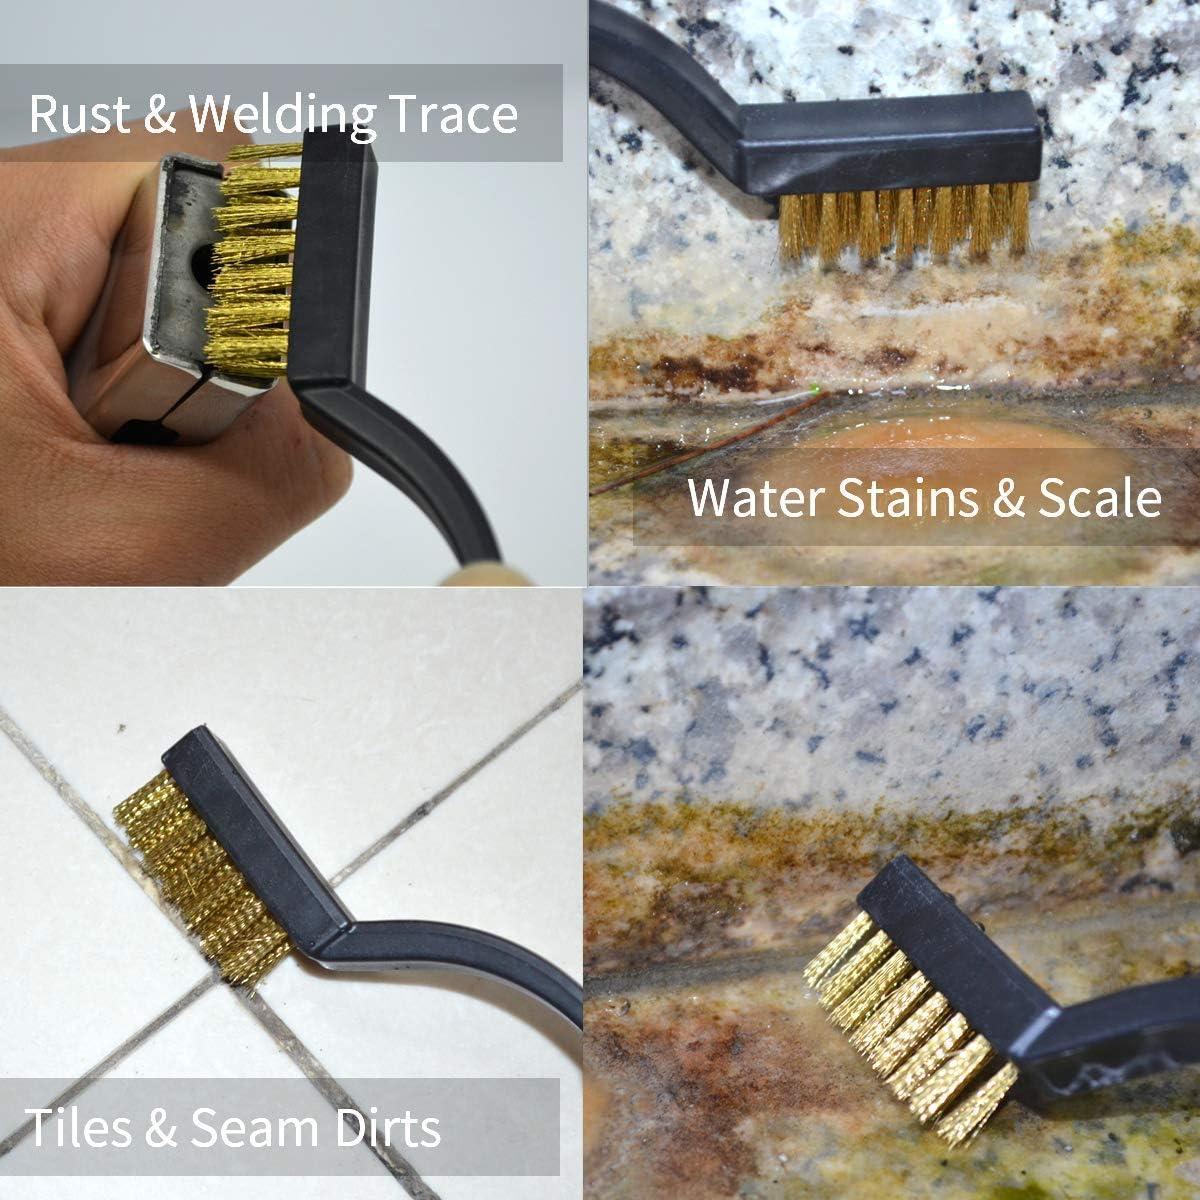 ESD Safe Anti Static Brush Set Detailing Cleaning Tool for Computer Mobile Phone Tablet PCB Motherboards BGA Keyboard Cameras Lens Repair Work 12 in 1